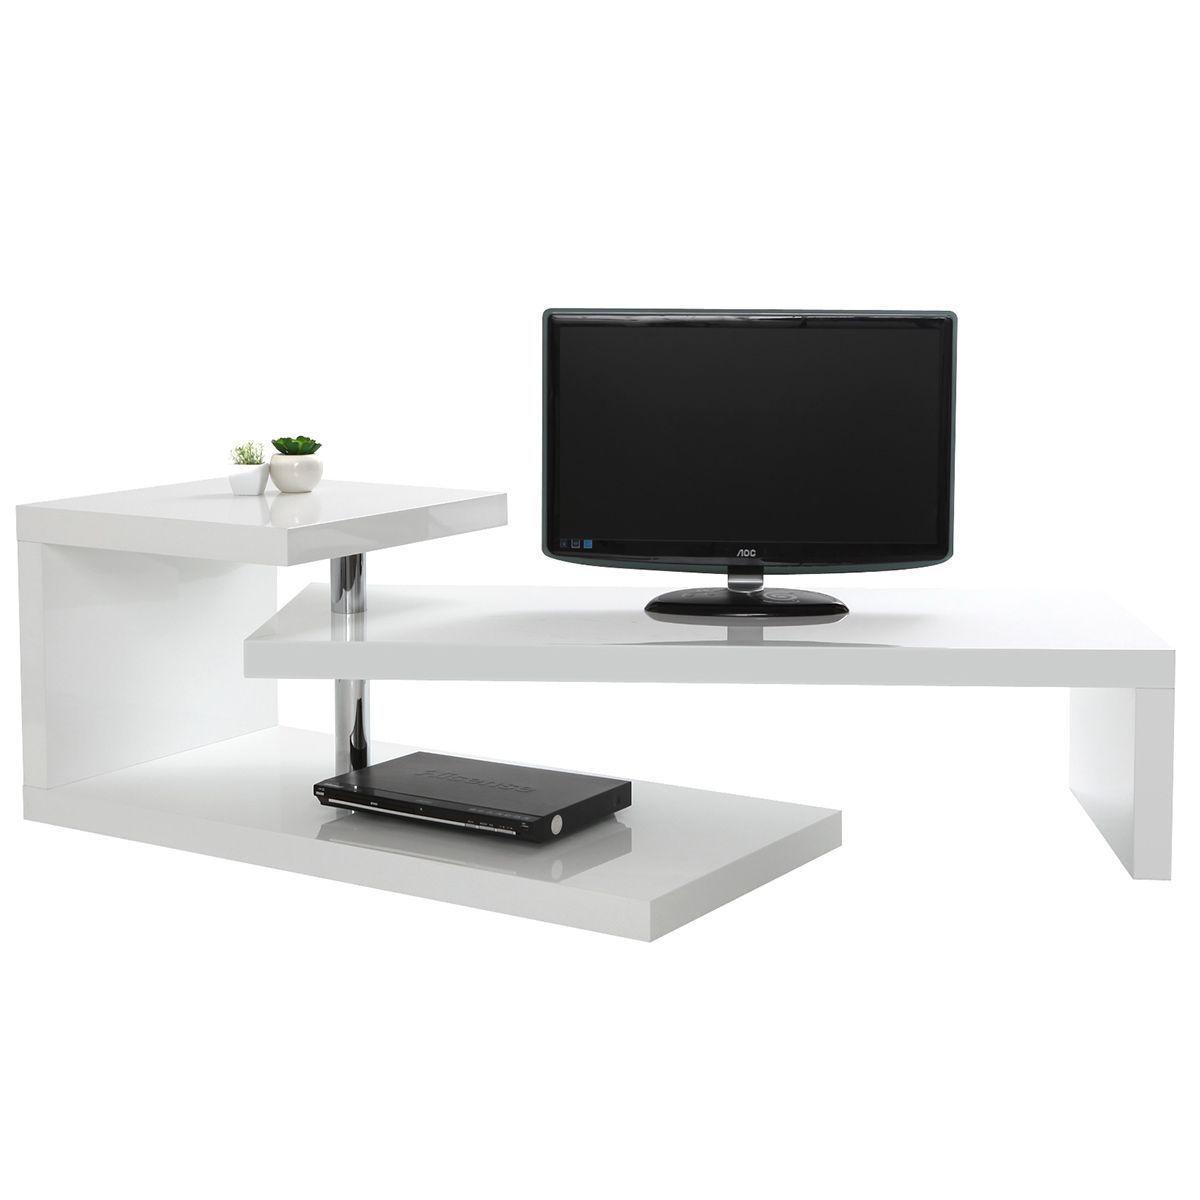 Meuble Tv Design Laque Blanc Turn Taille Taille Unique En 2020 Meuble Tv Design Meuble Tv Design Laque Et Meuble Tv